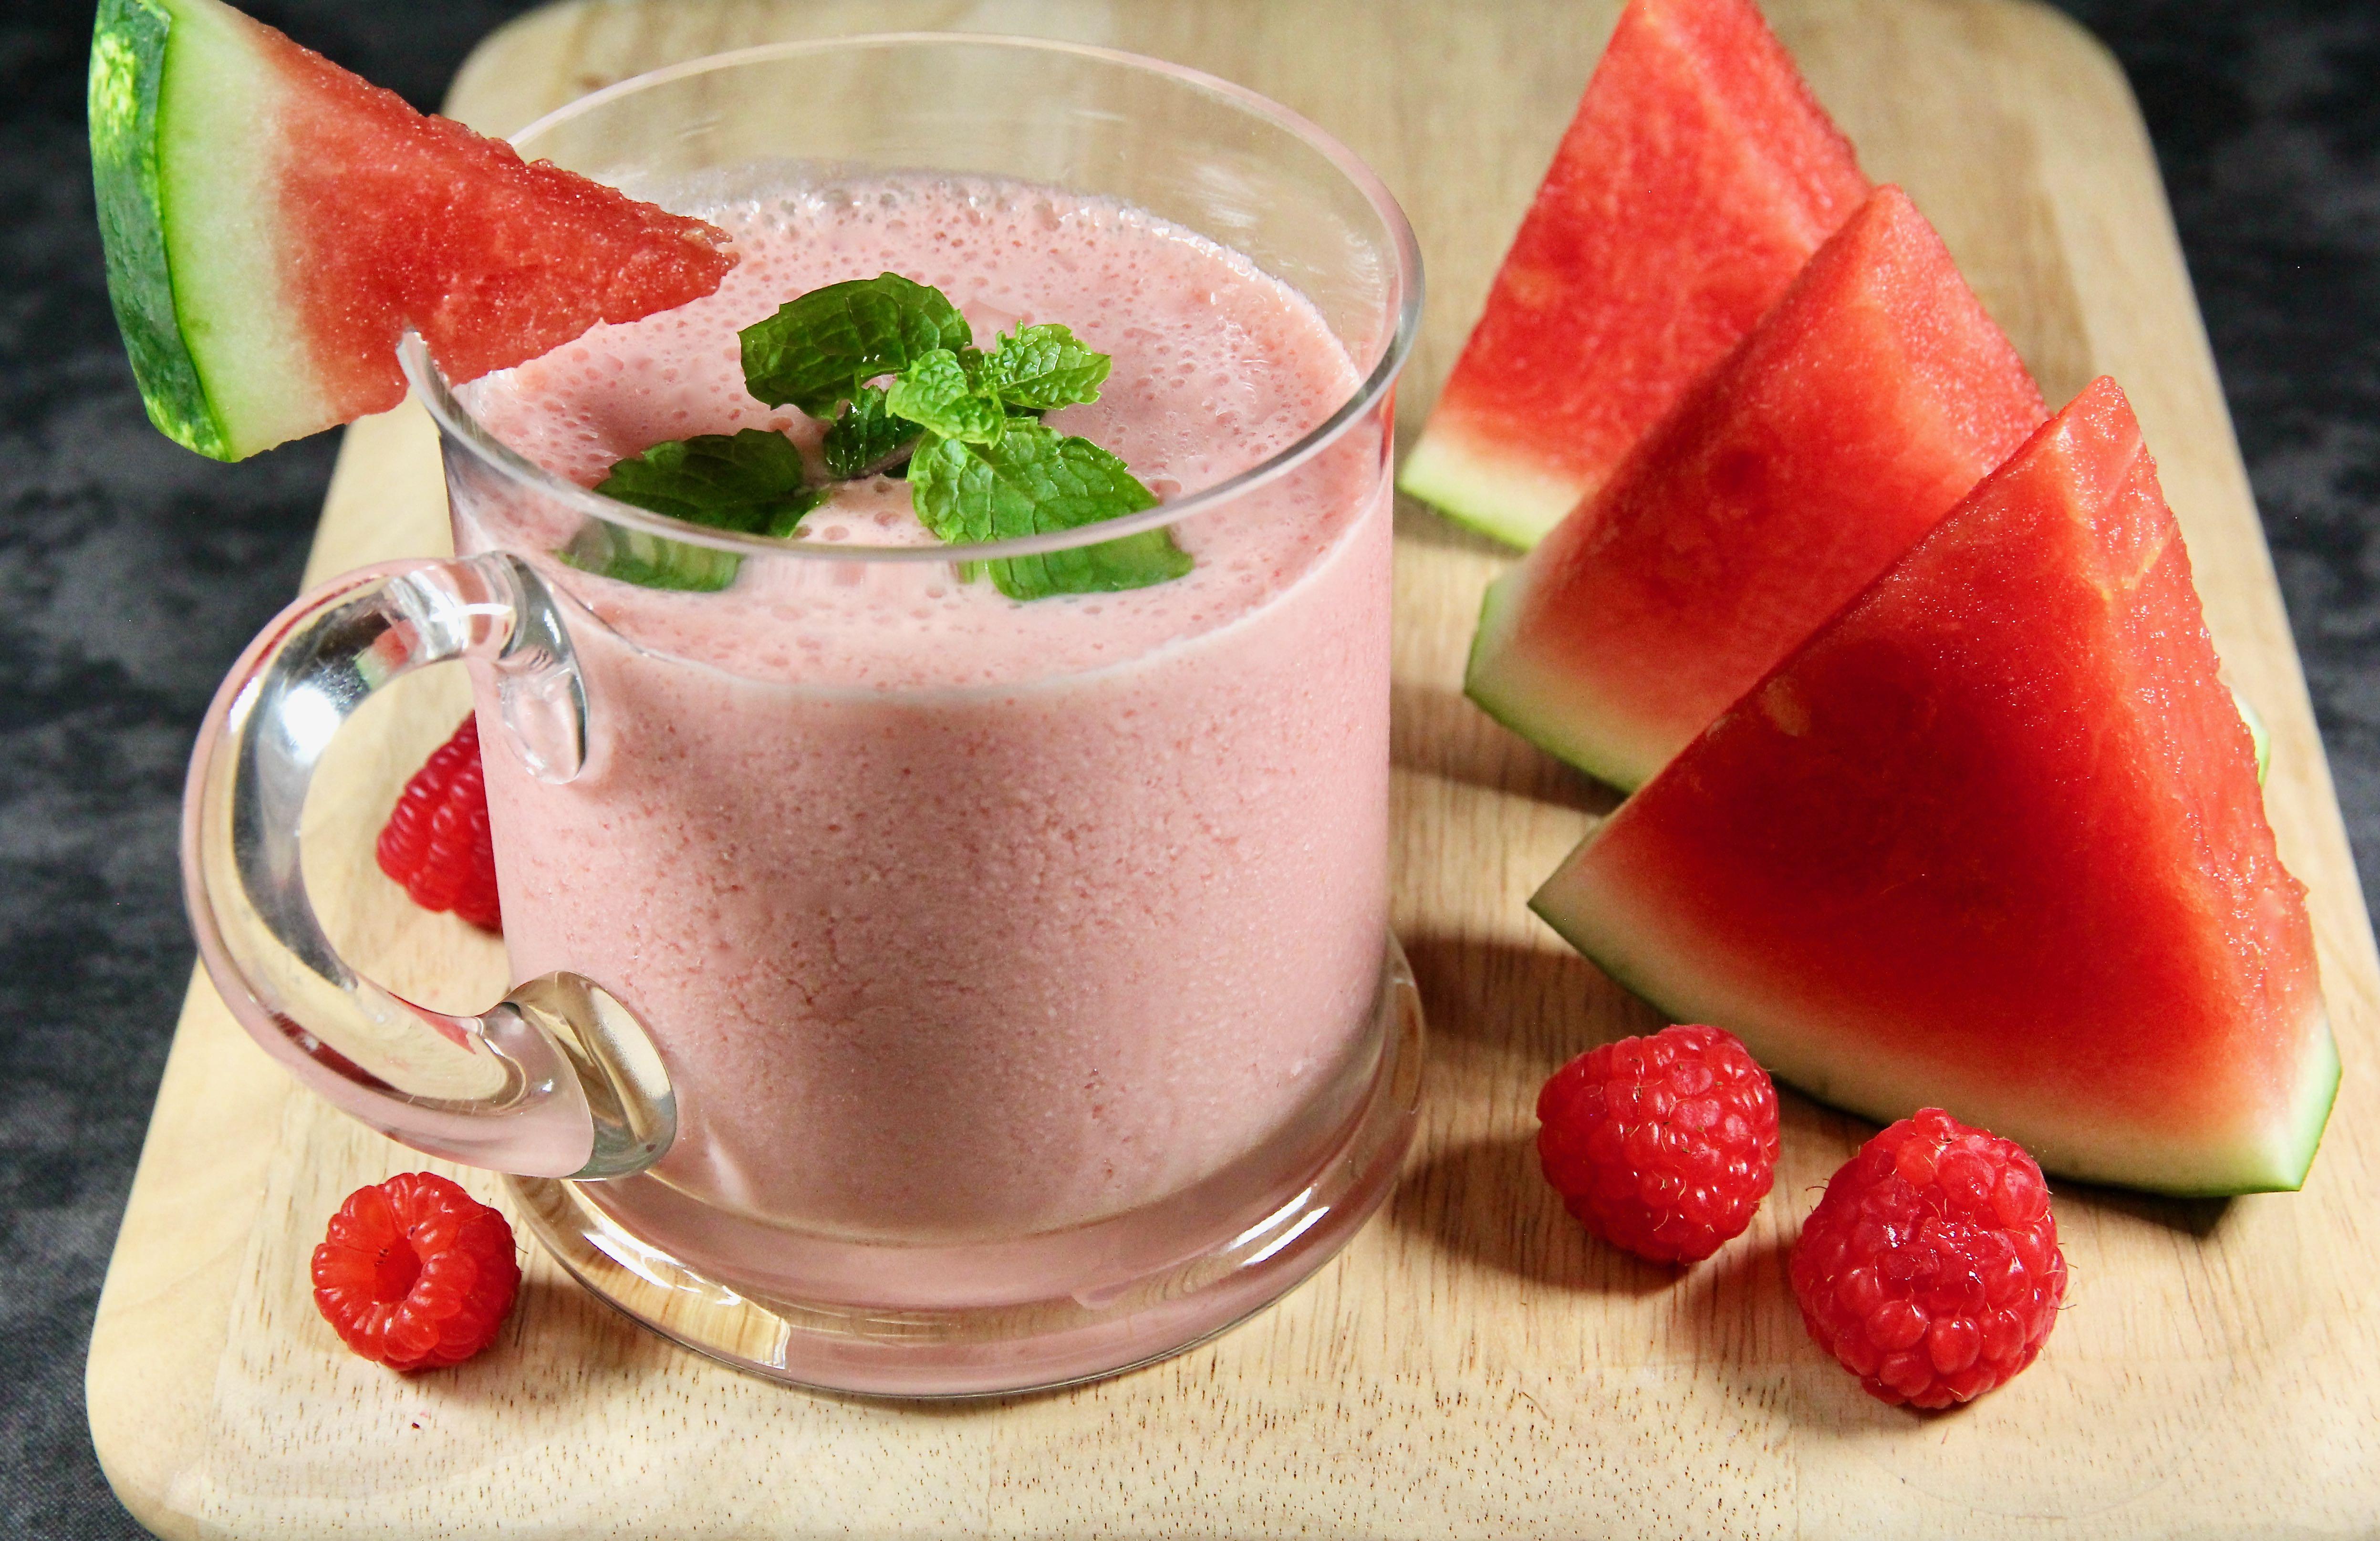 Watermelon-Raspberry Smoothie